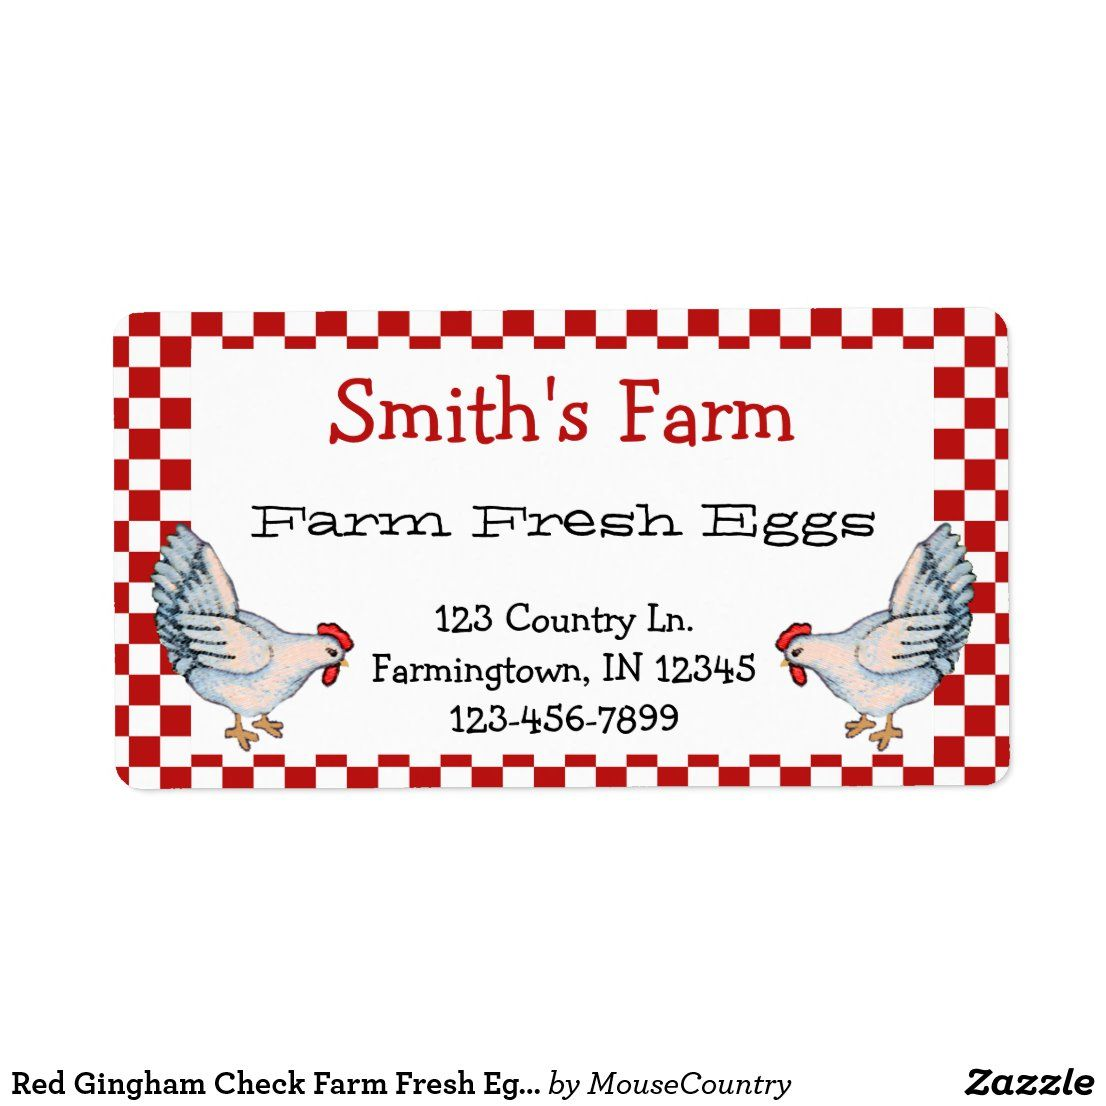 Red Gingham Check Farm Fresh Eggs Chickens Label